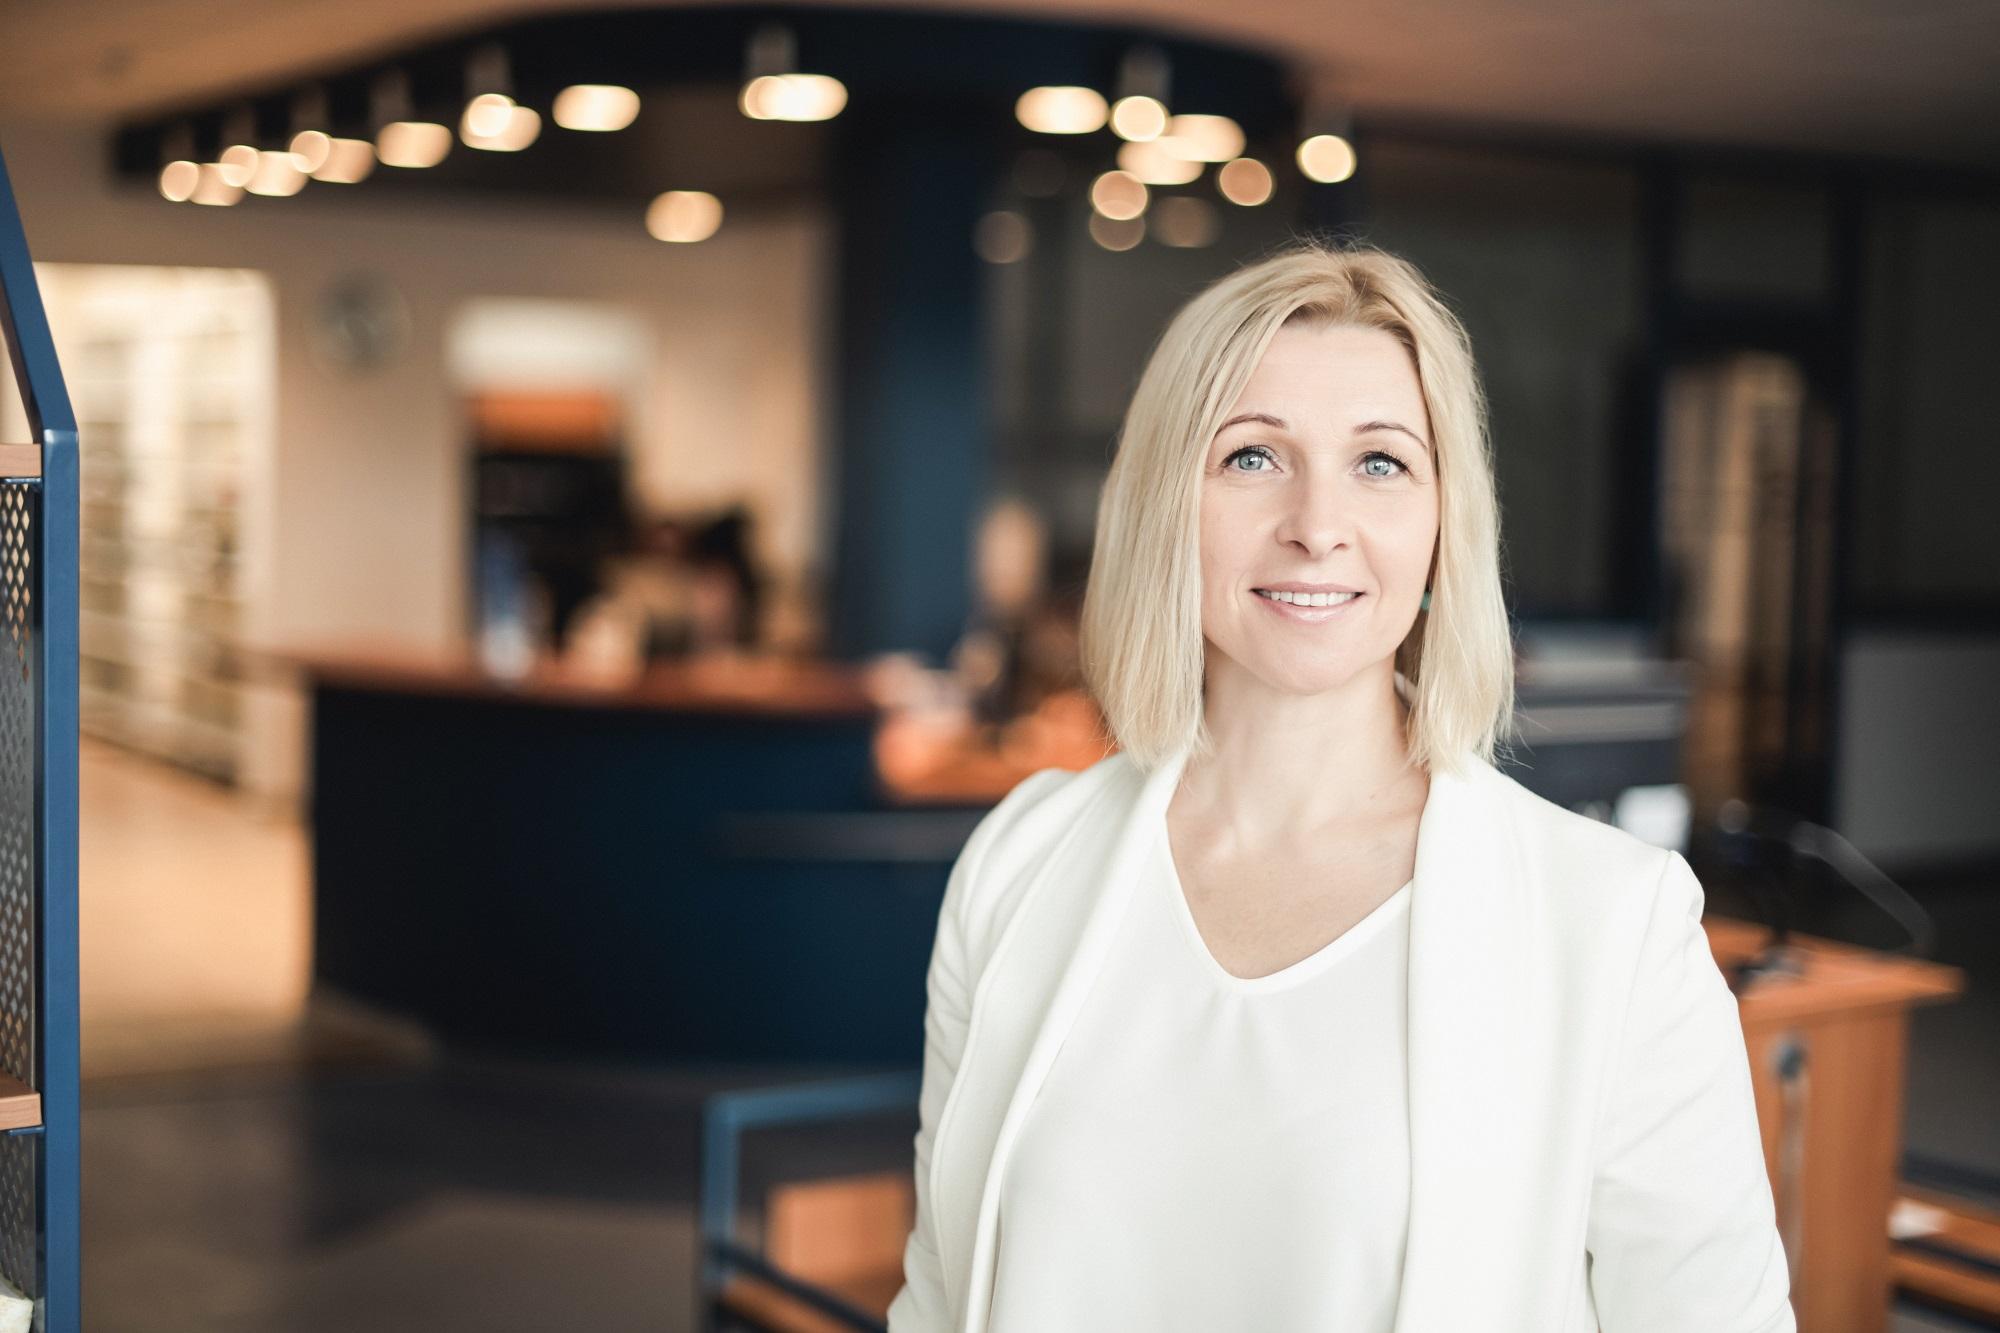 Vilniaus Gedimino technikos universiteto bibliotekos direktorė Ingrida Kasperaitienė | S. Bernoto nuotr.